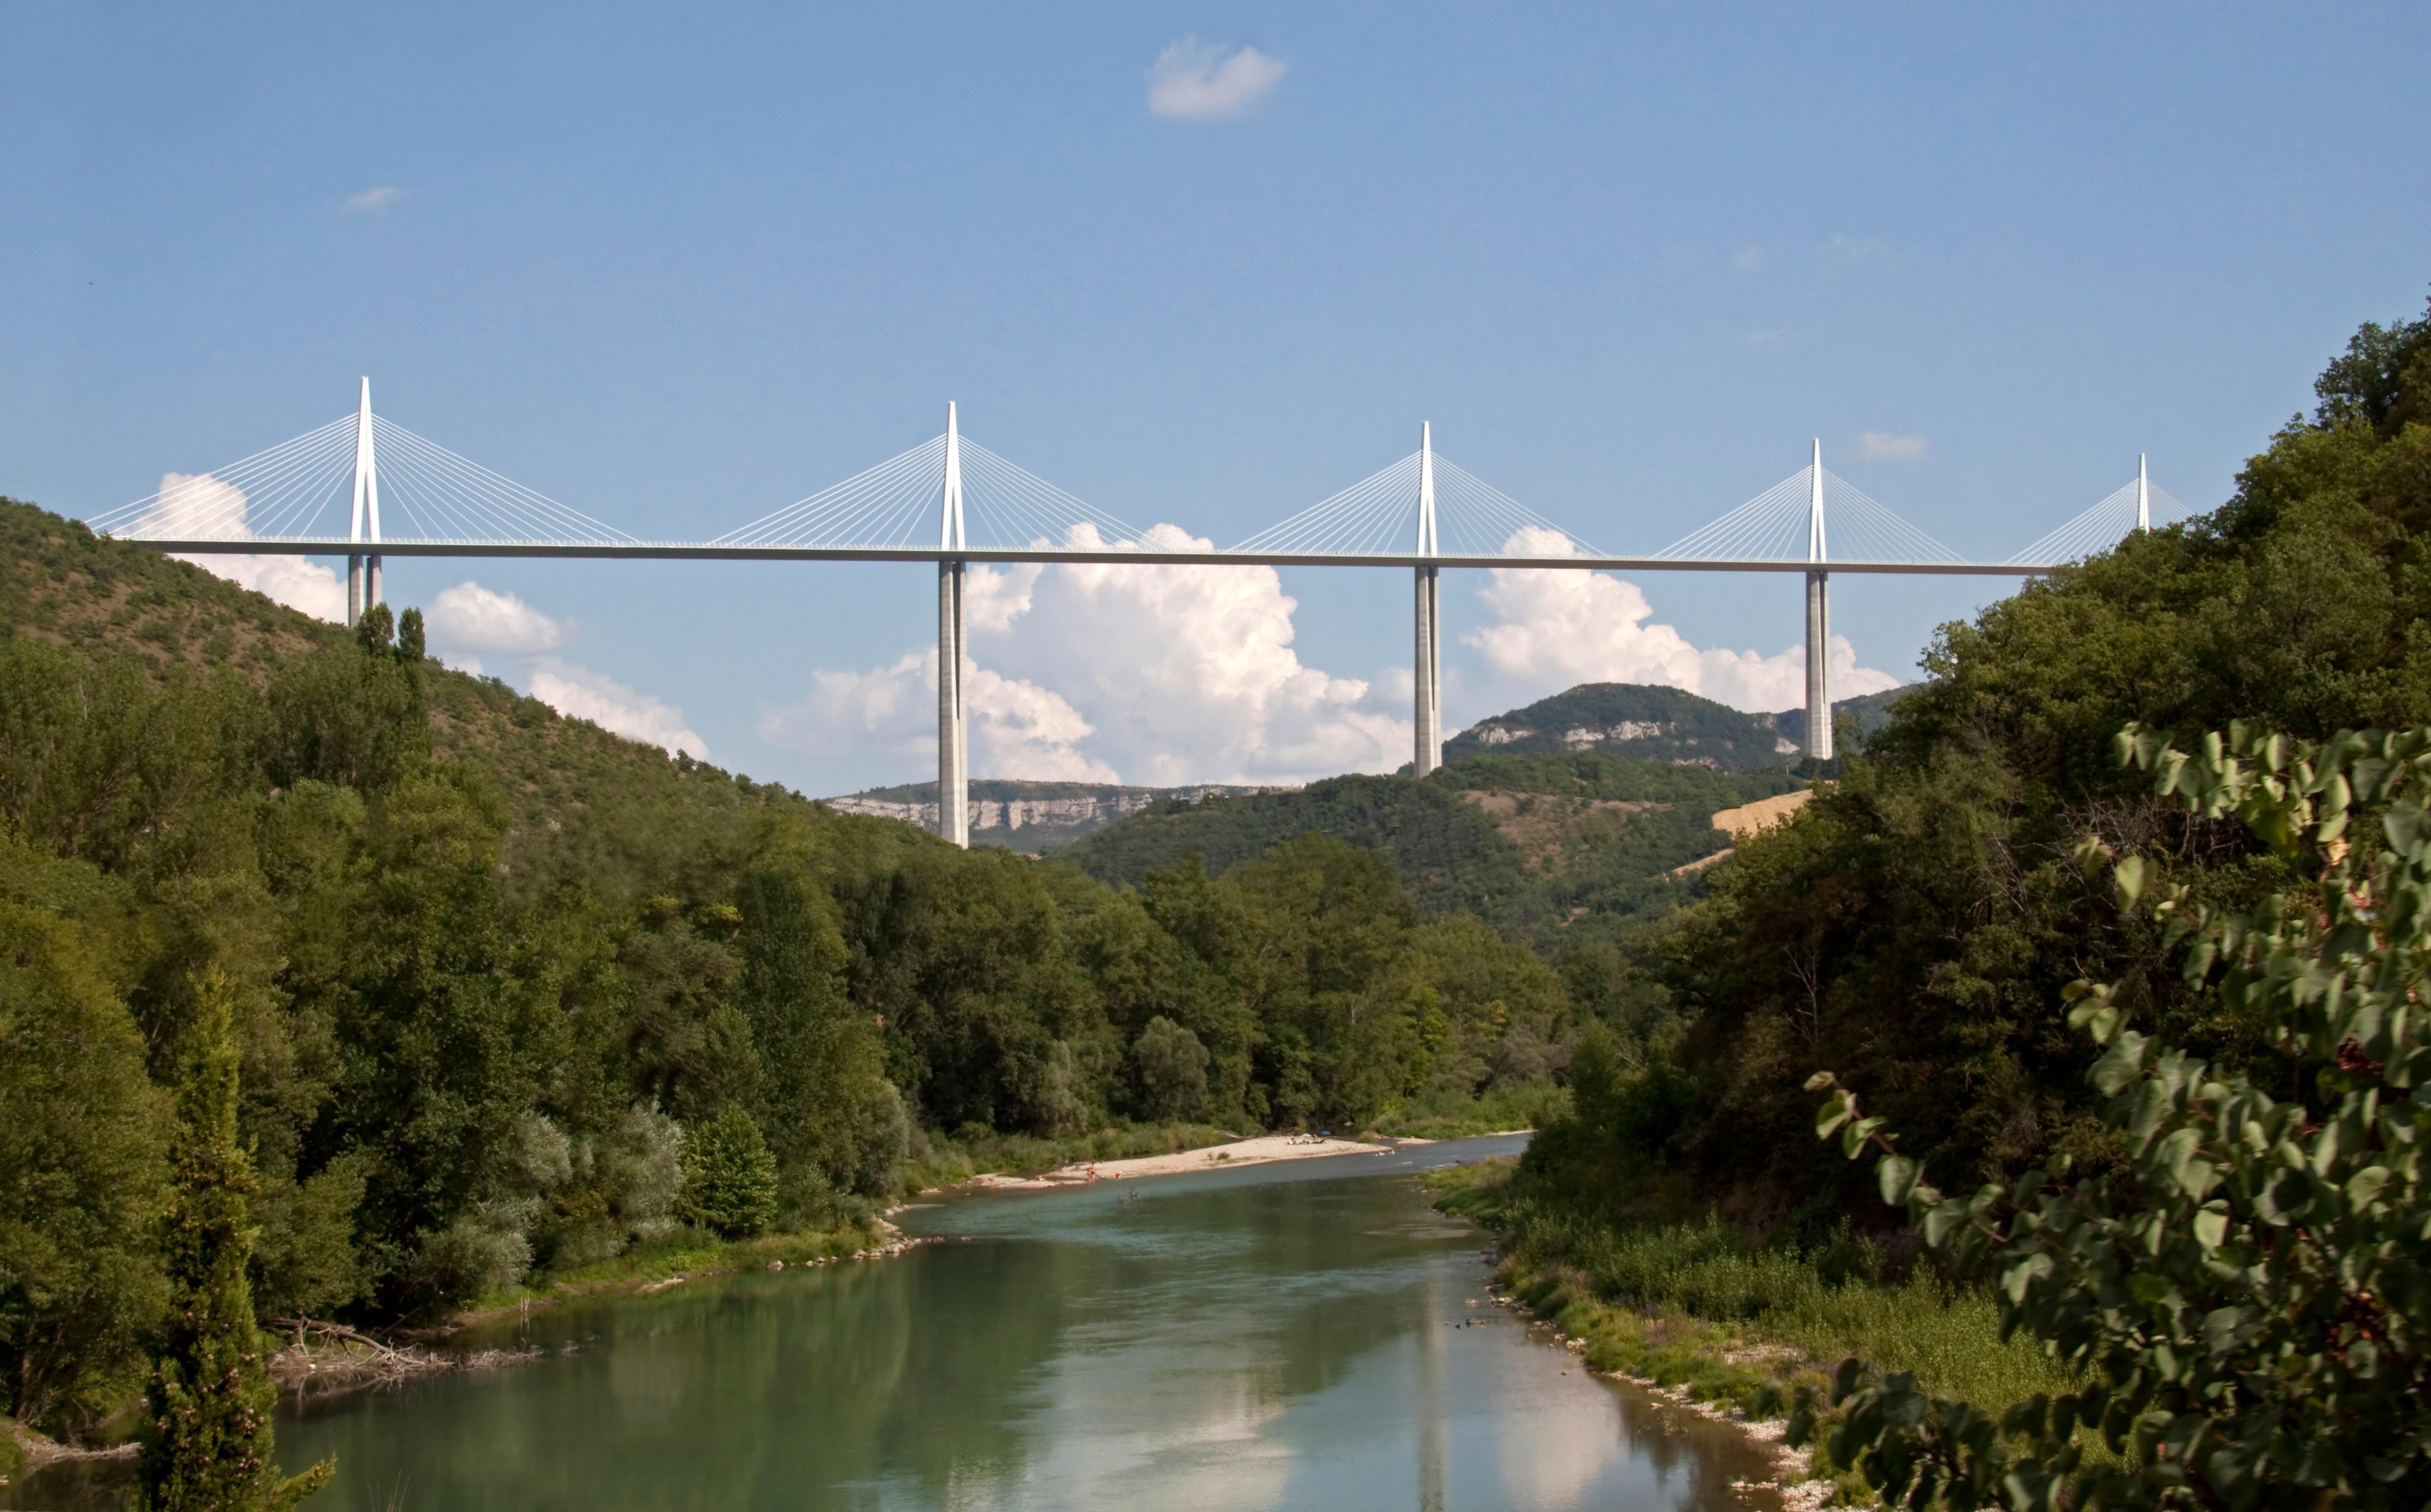 Millau_Viaduct_over_the_River_Tarn_(3855053467)